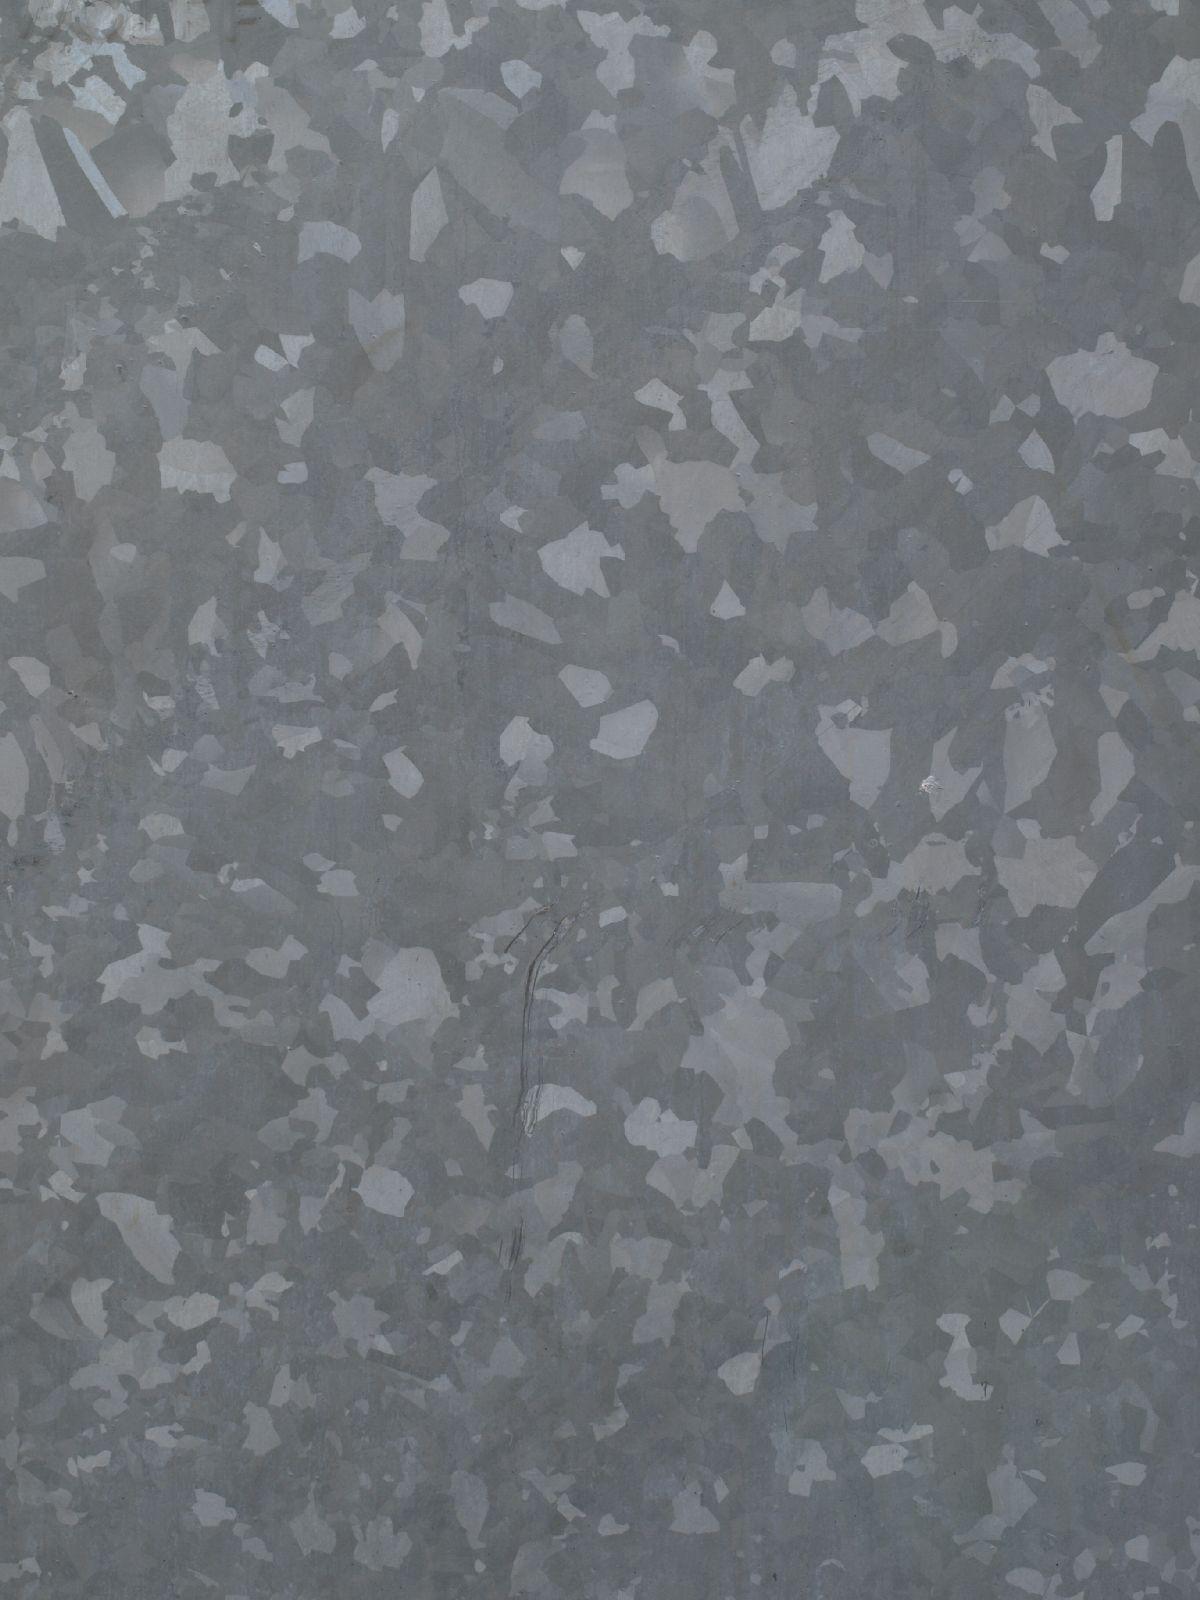 Metall_Textur_A_P4171312